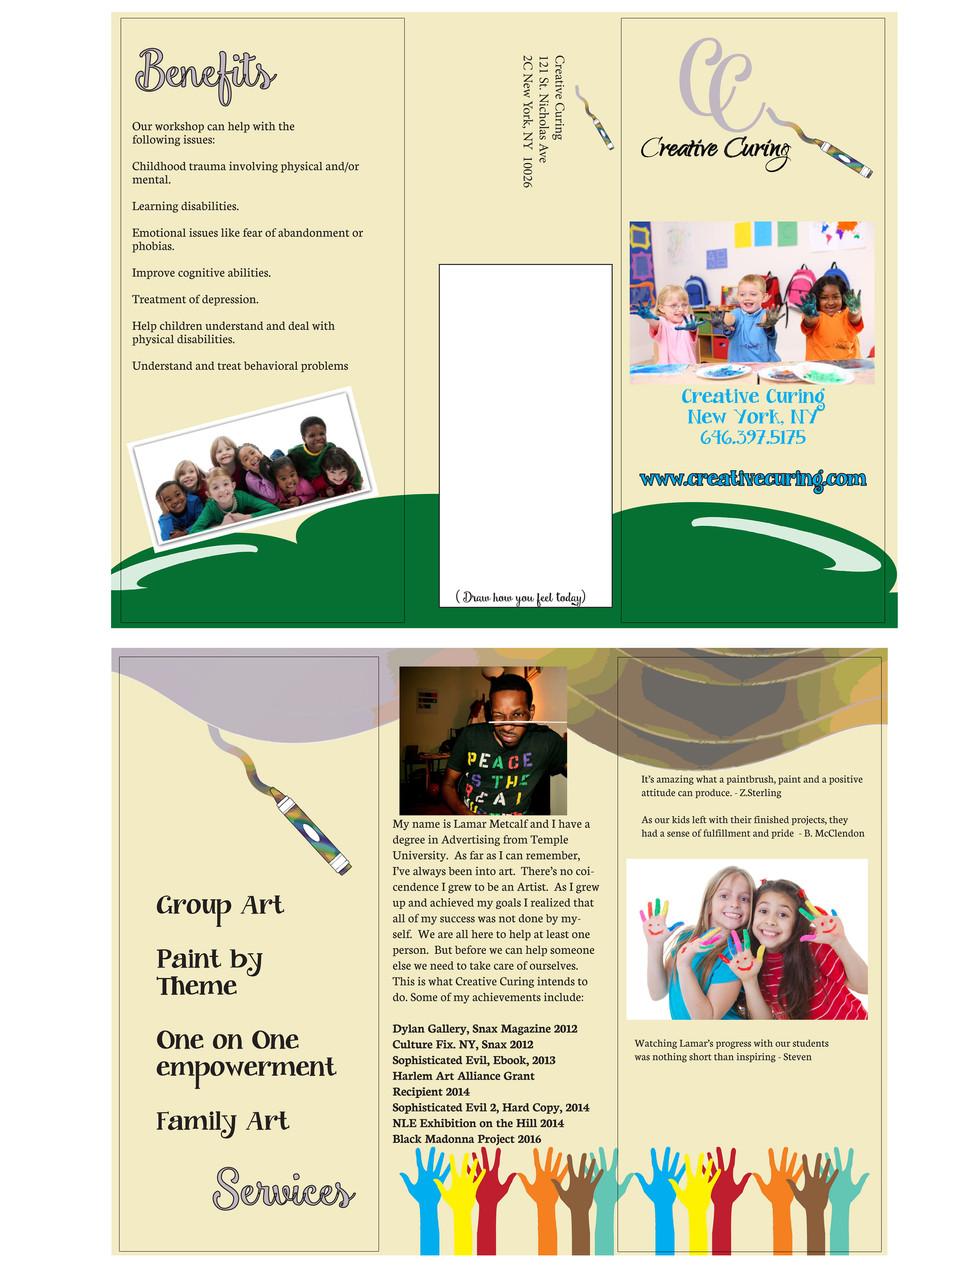 Creative_Curing_brochure_example.jpg